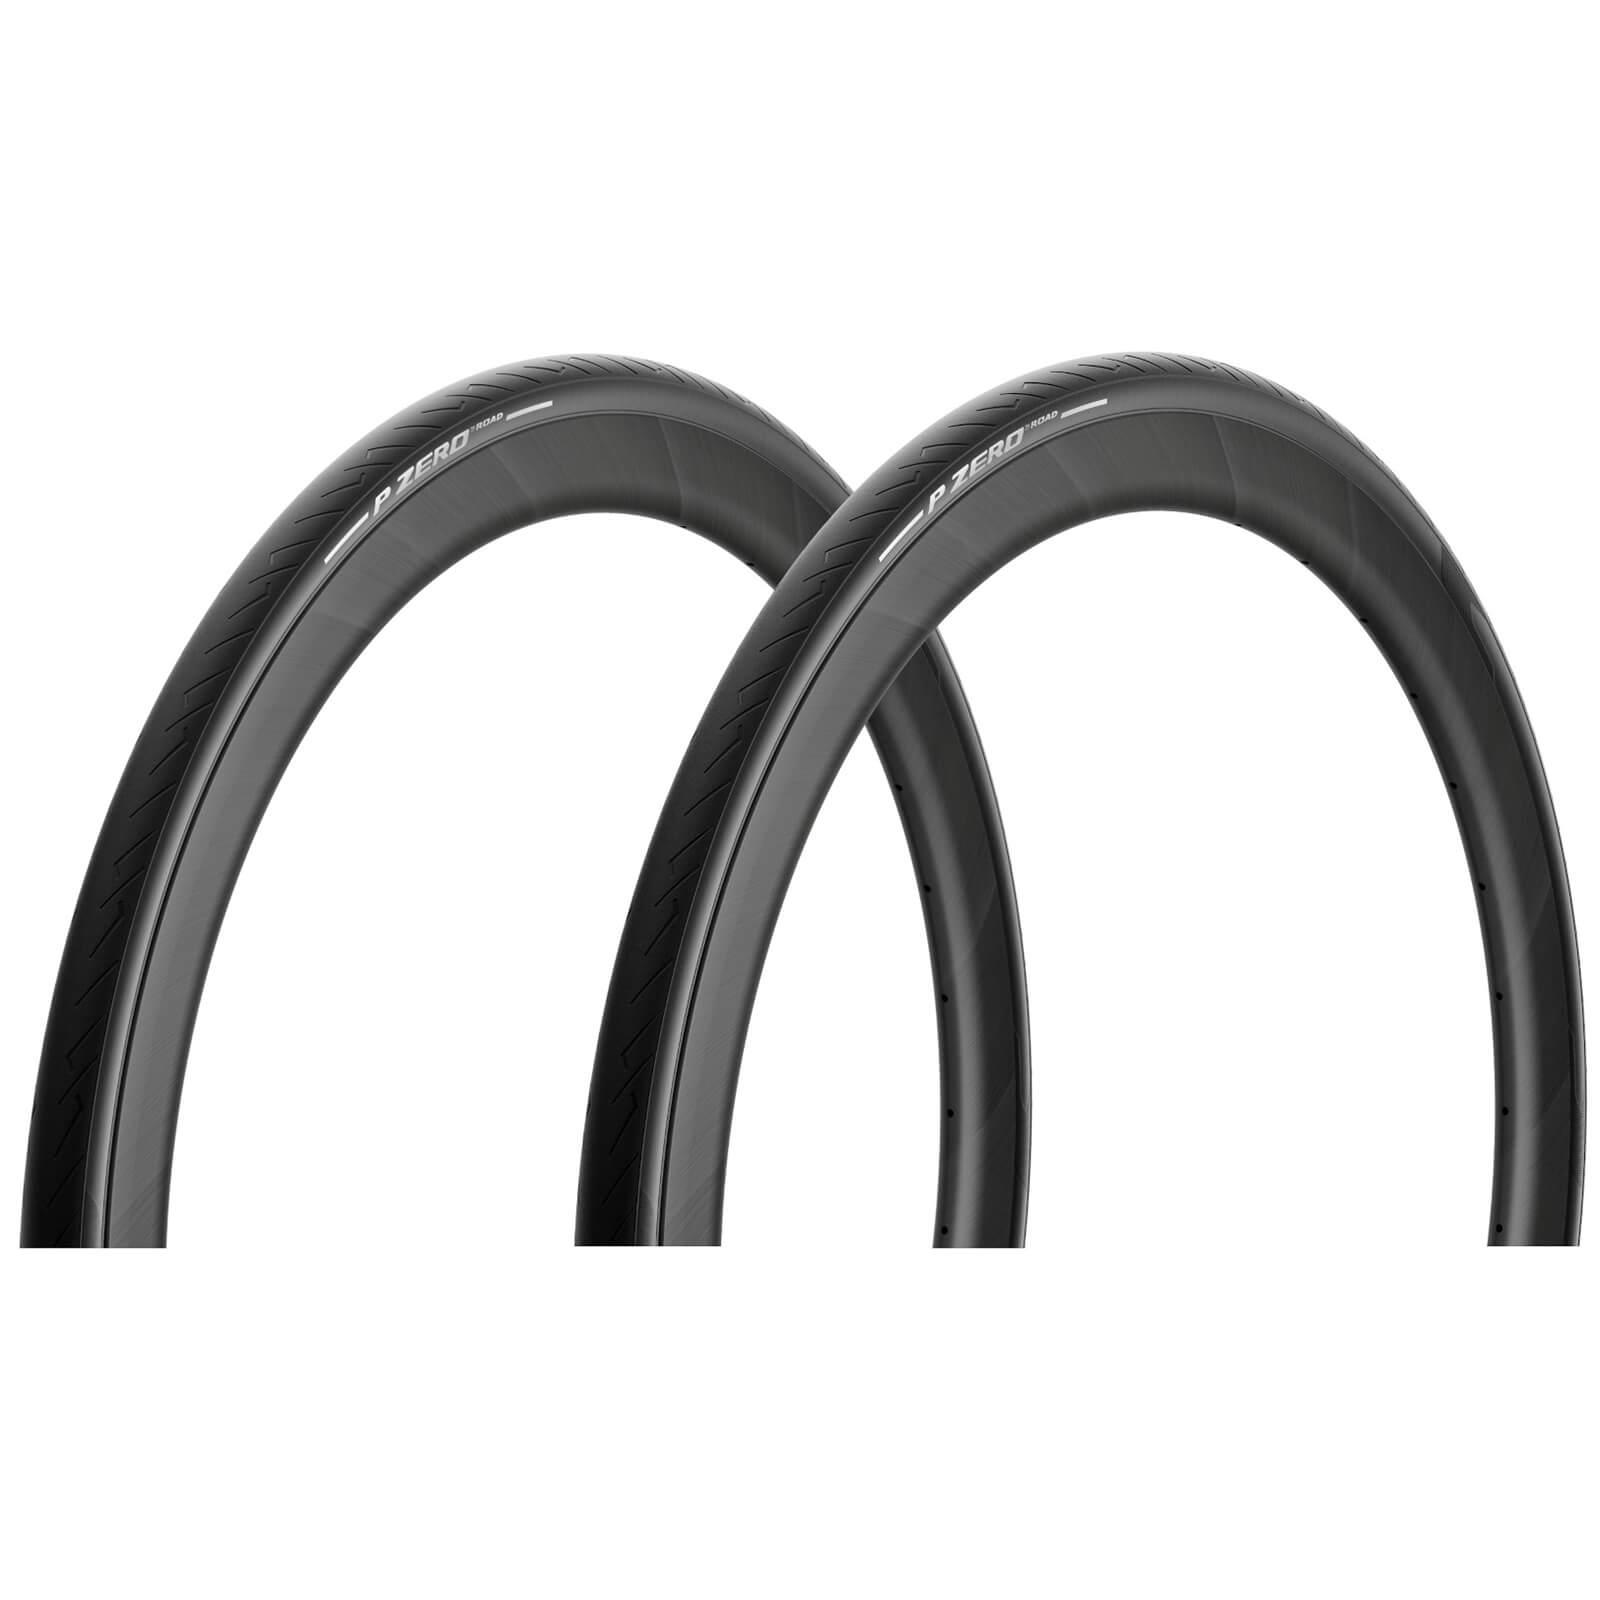 Pirelli P ZERO™ Road Clincher Road Tyre Twin Pack - 24mm